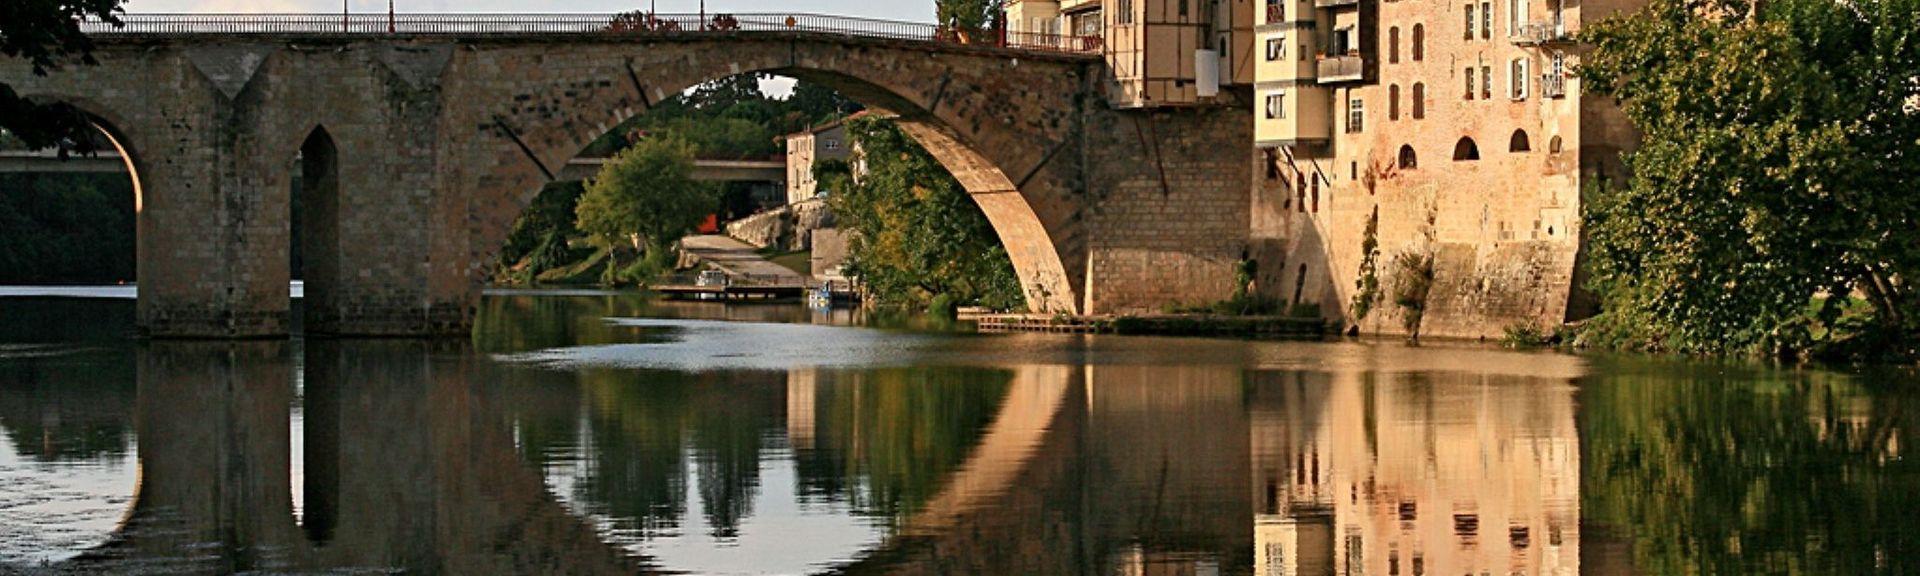 Labretonie, France